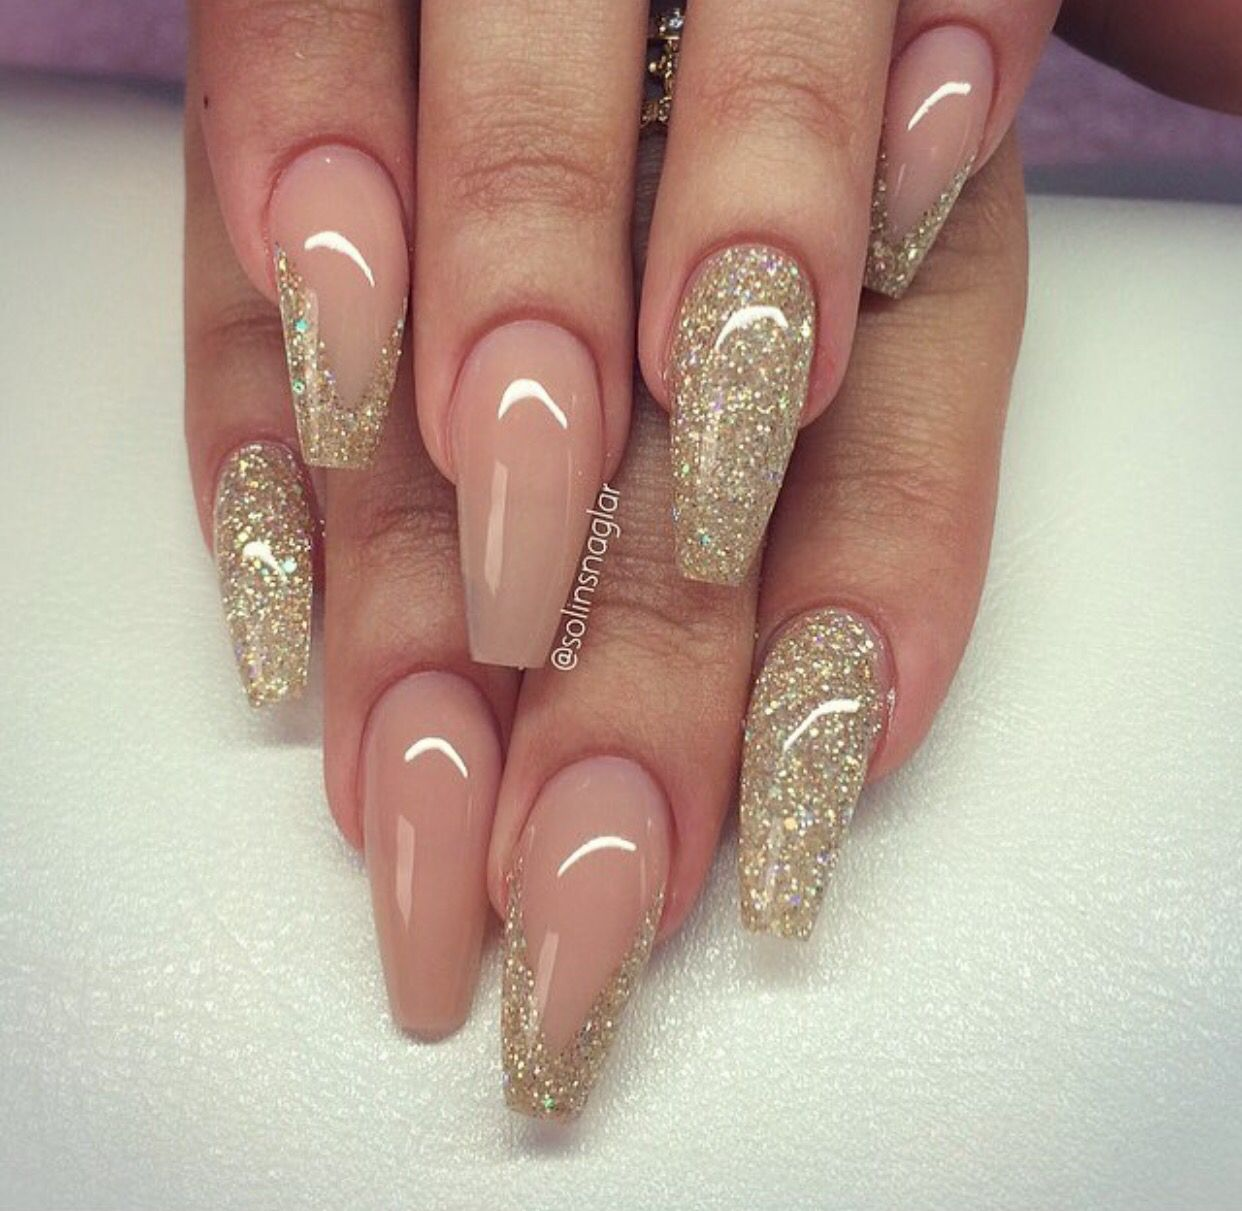 Acryl nagels Ideeën Ovaal Mooie nagels Oh om een meisje